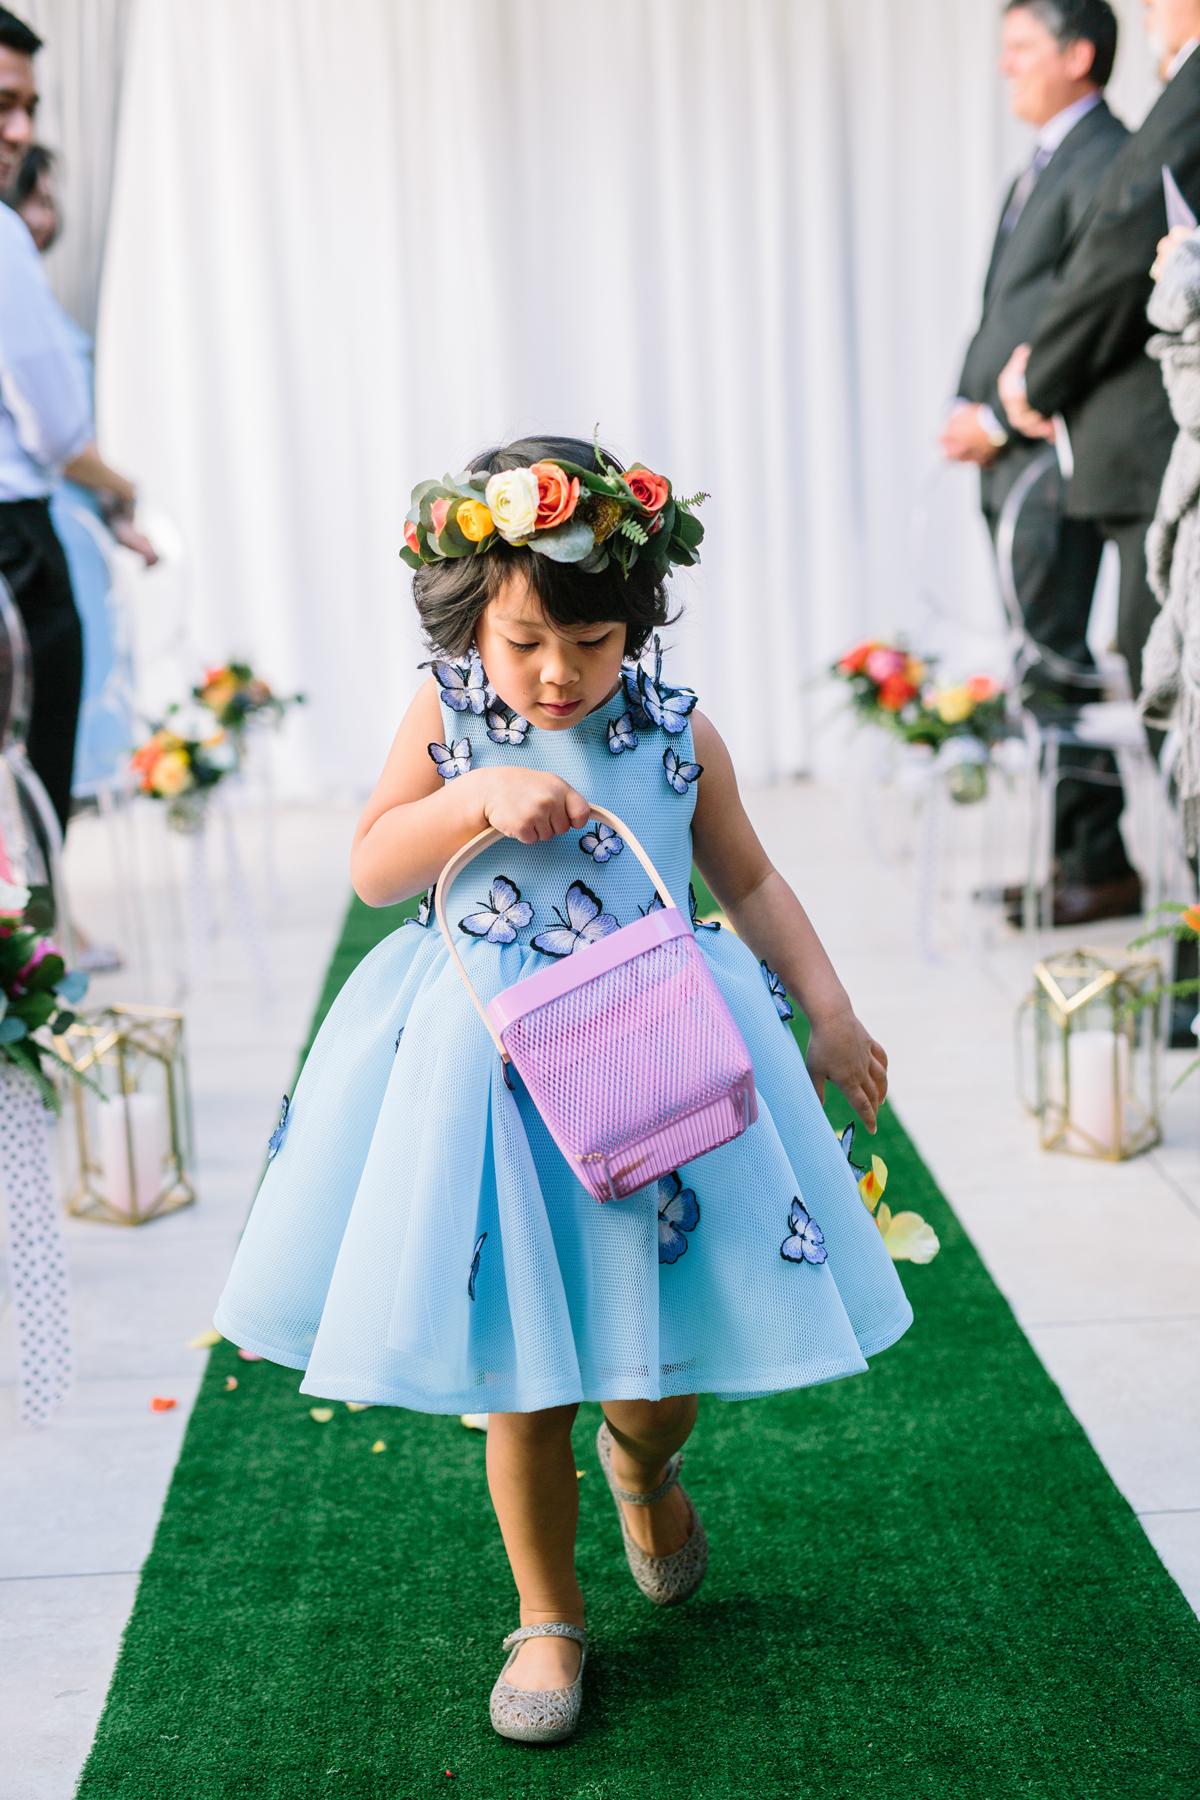 flower girl wearing blue dress with butterfly applique